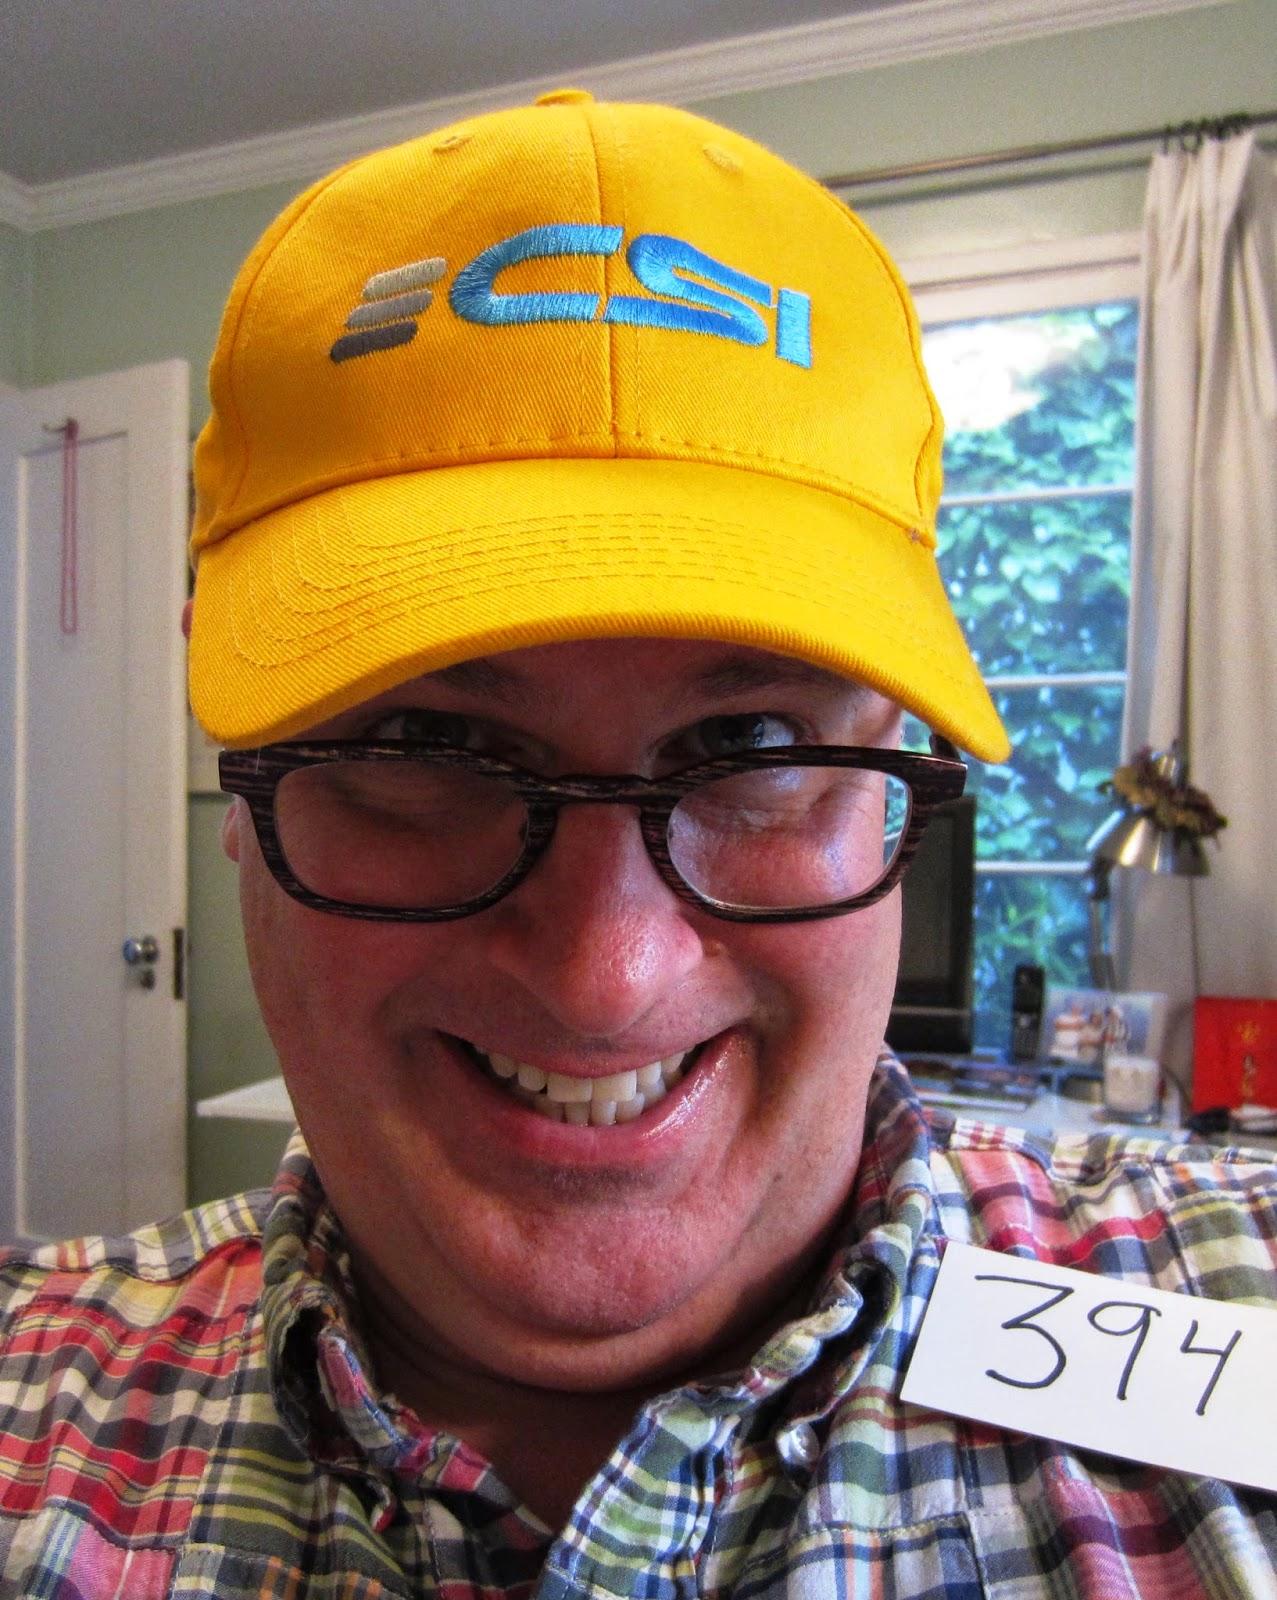 24e54ec6e4750 Adam s Riff  Project Cubbins  Hat 394 - Evidence Montage Edition